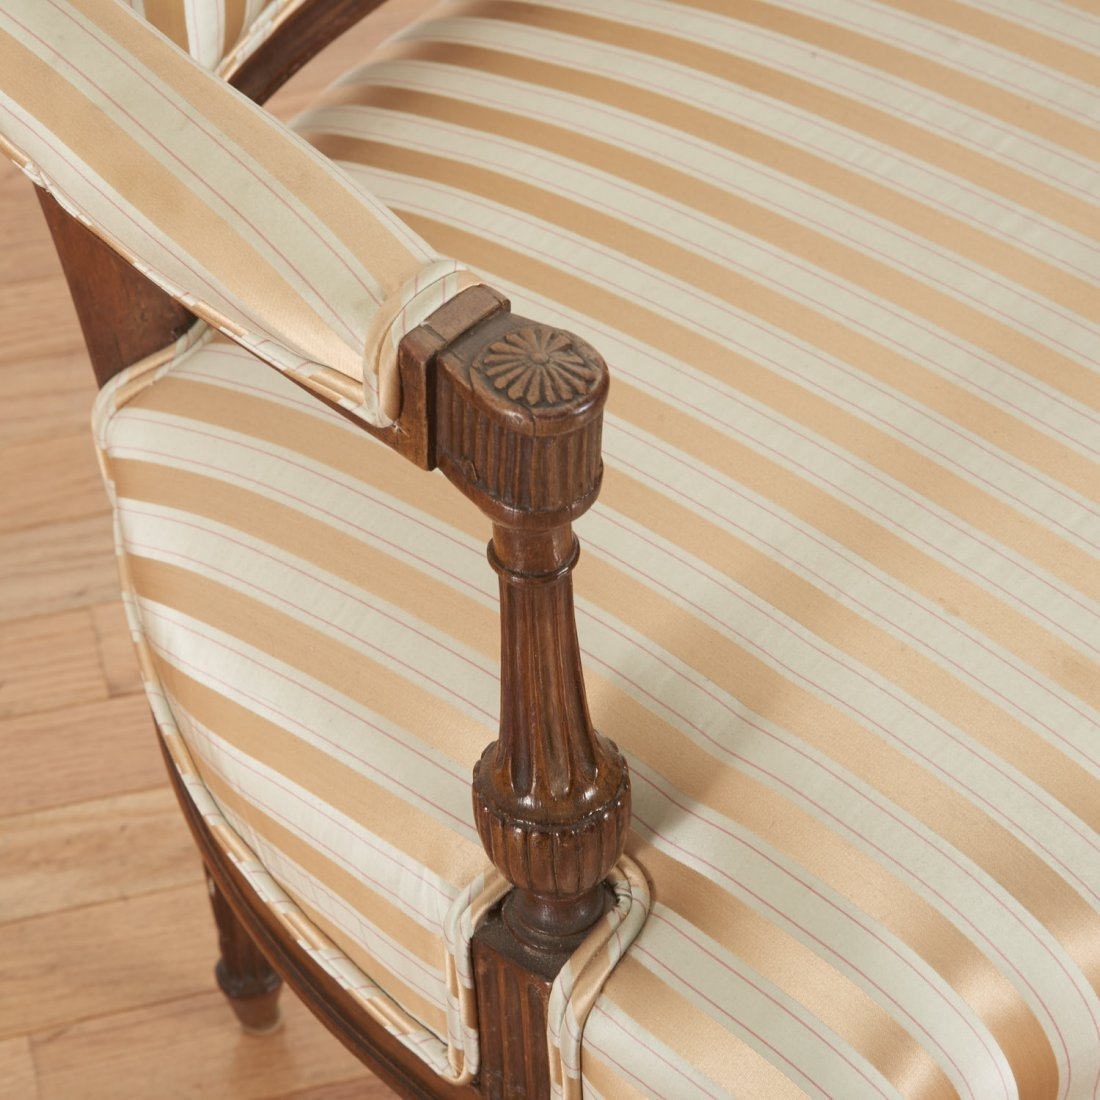 Pr Directoire silk upholstered mahogany fauteuils - 5